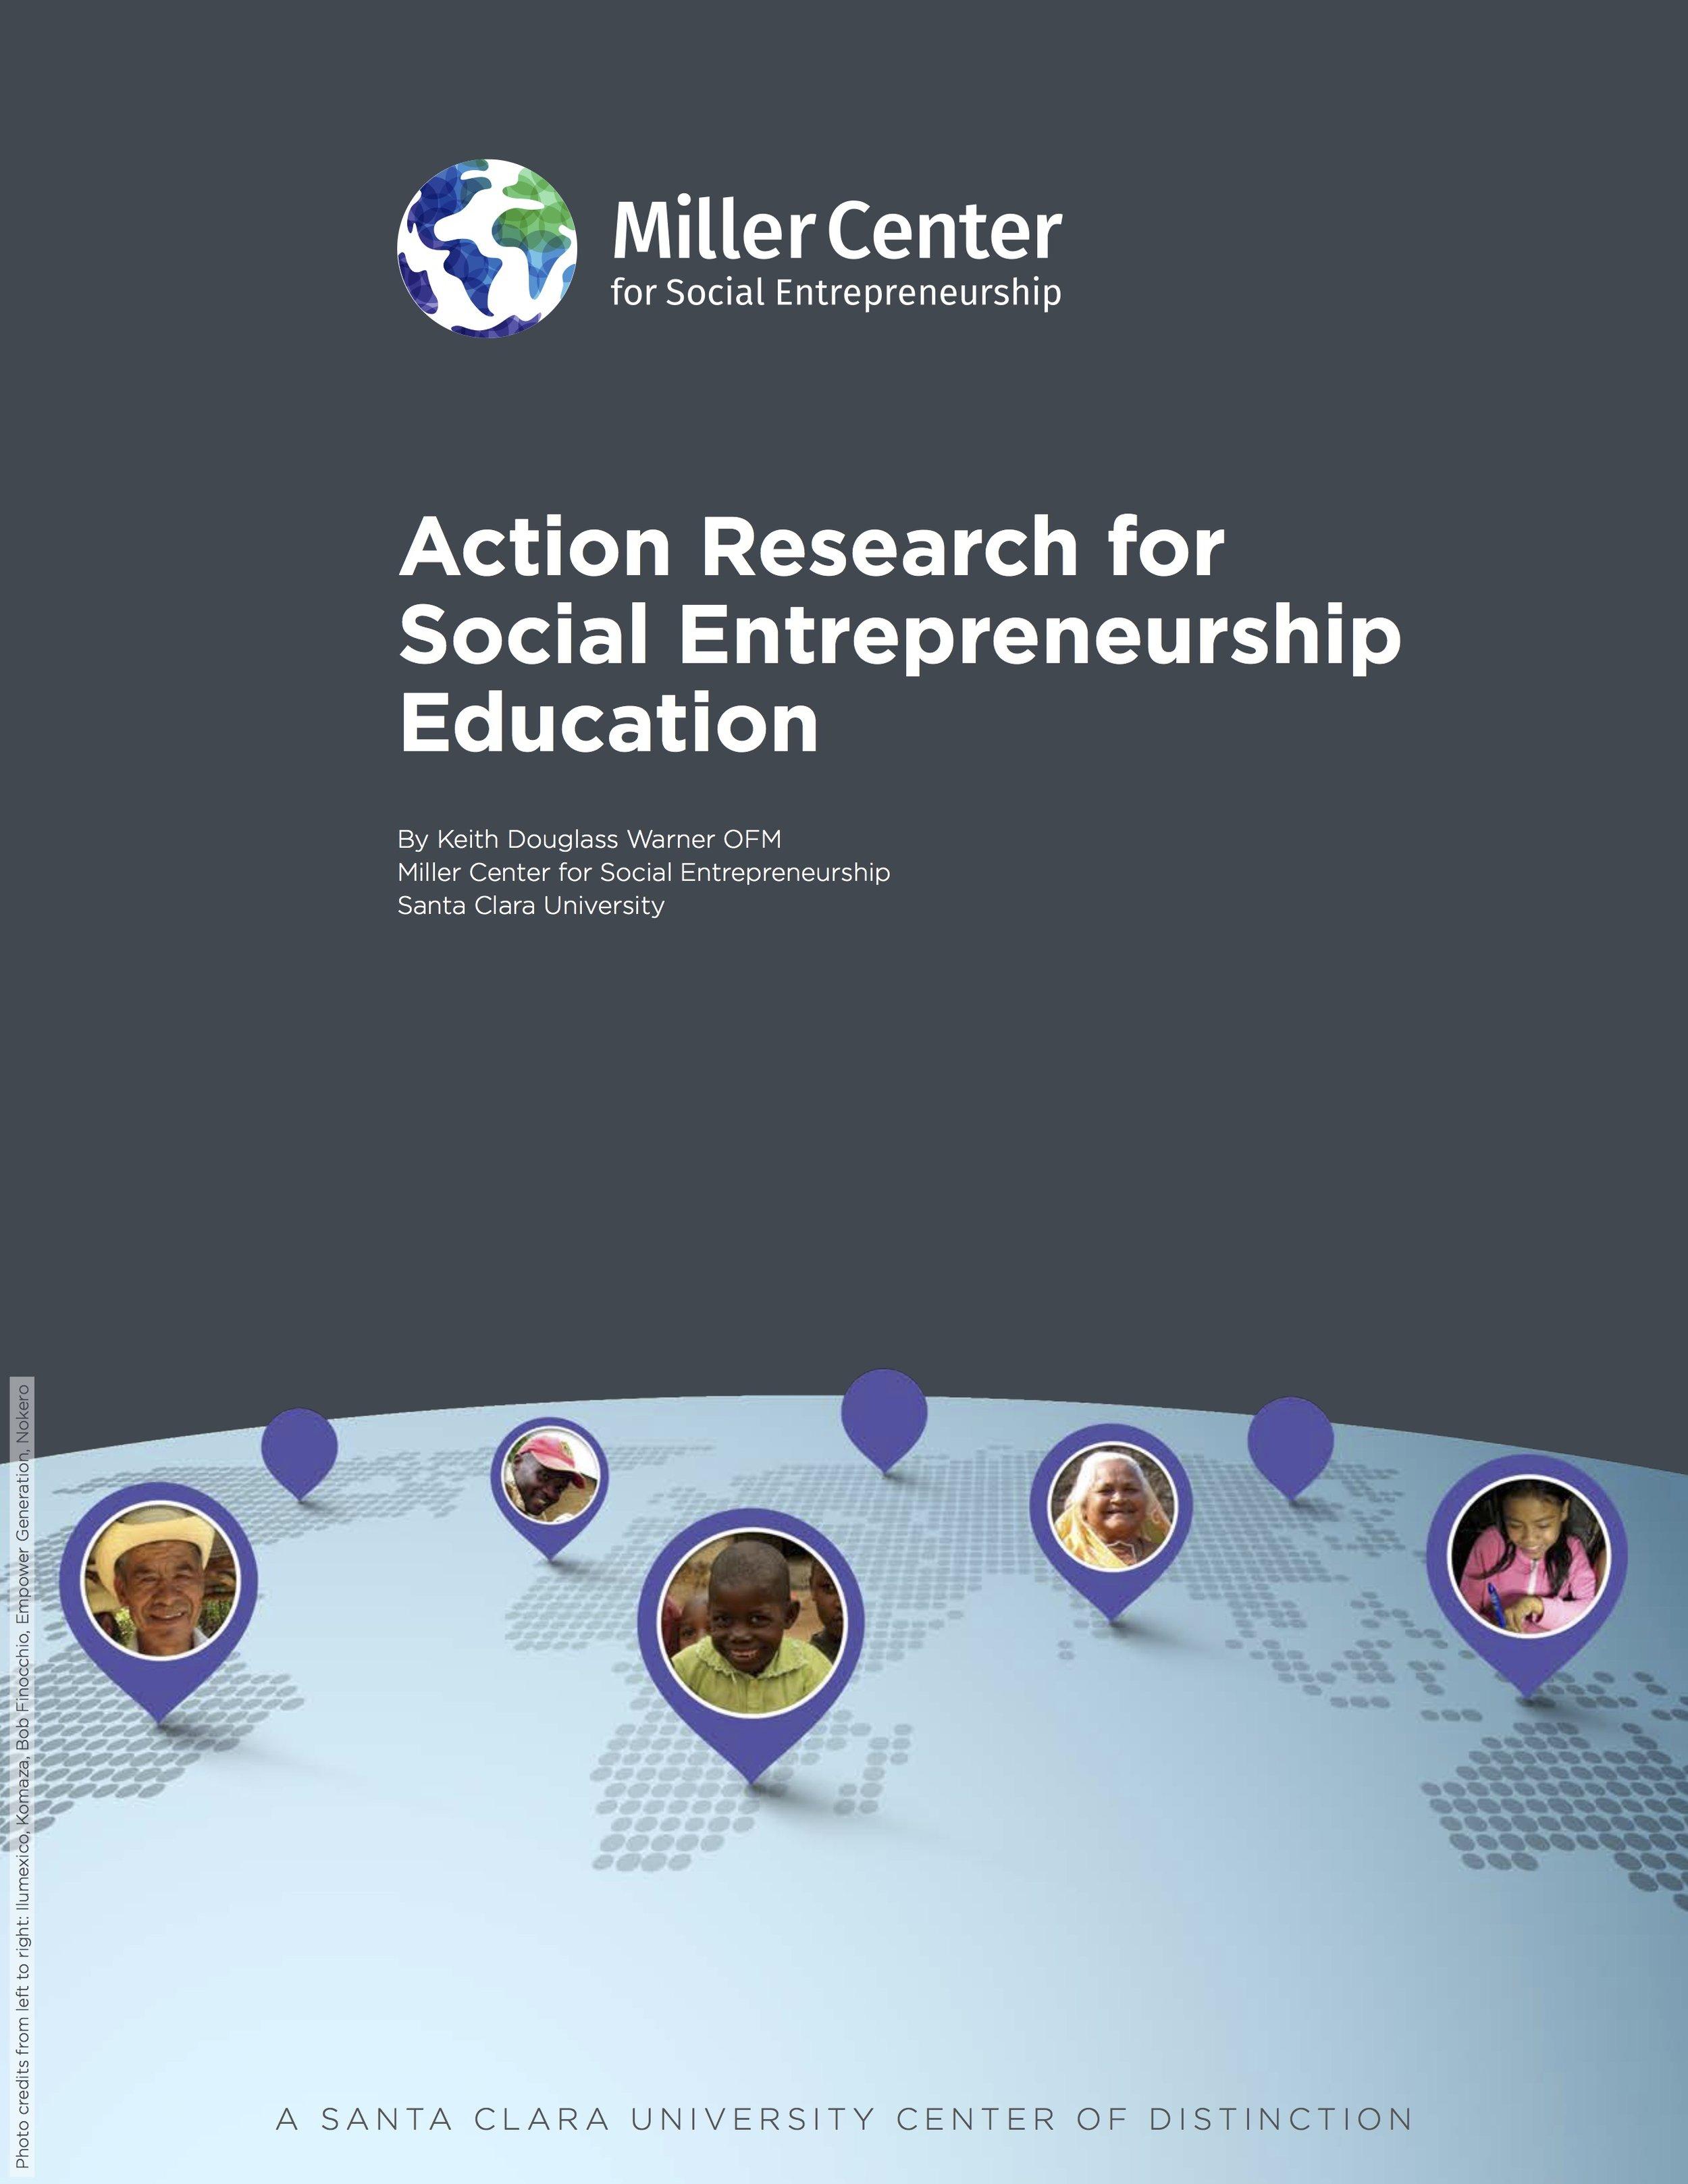 Action Research for Social Entrepreneurship Education White Paper